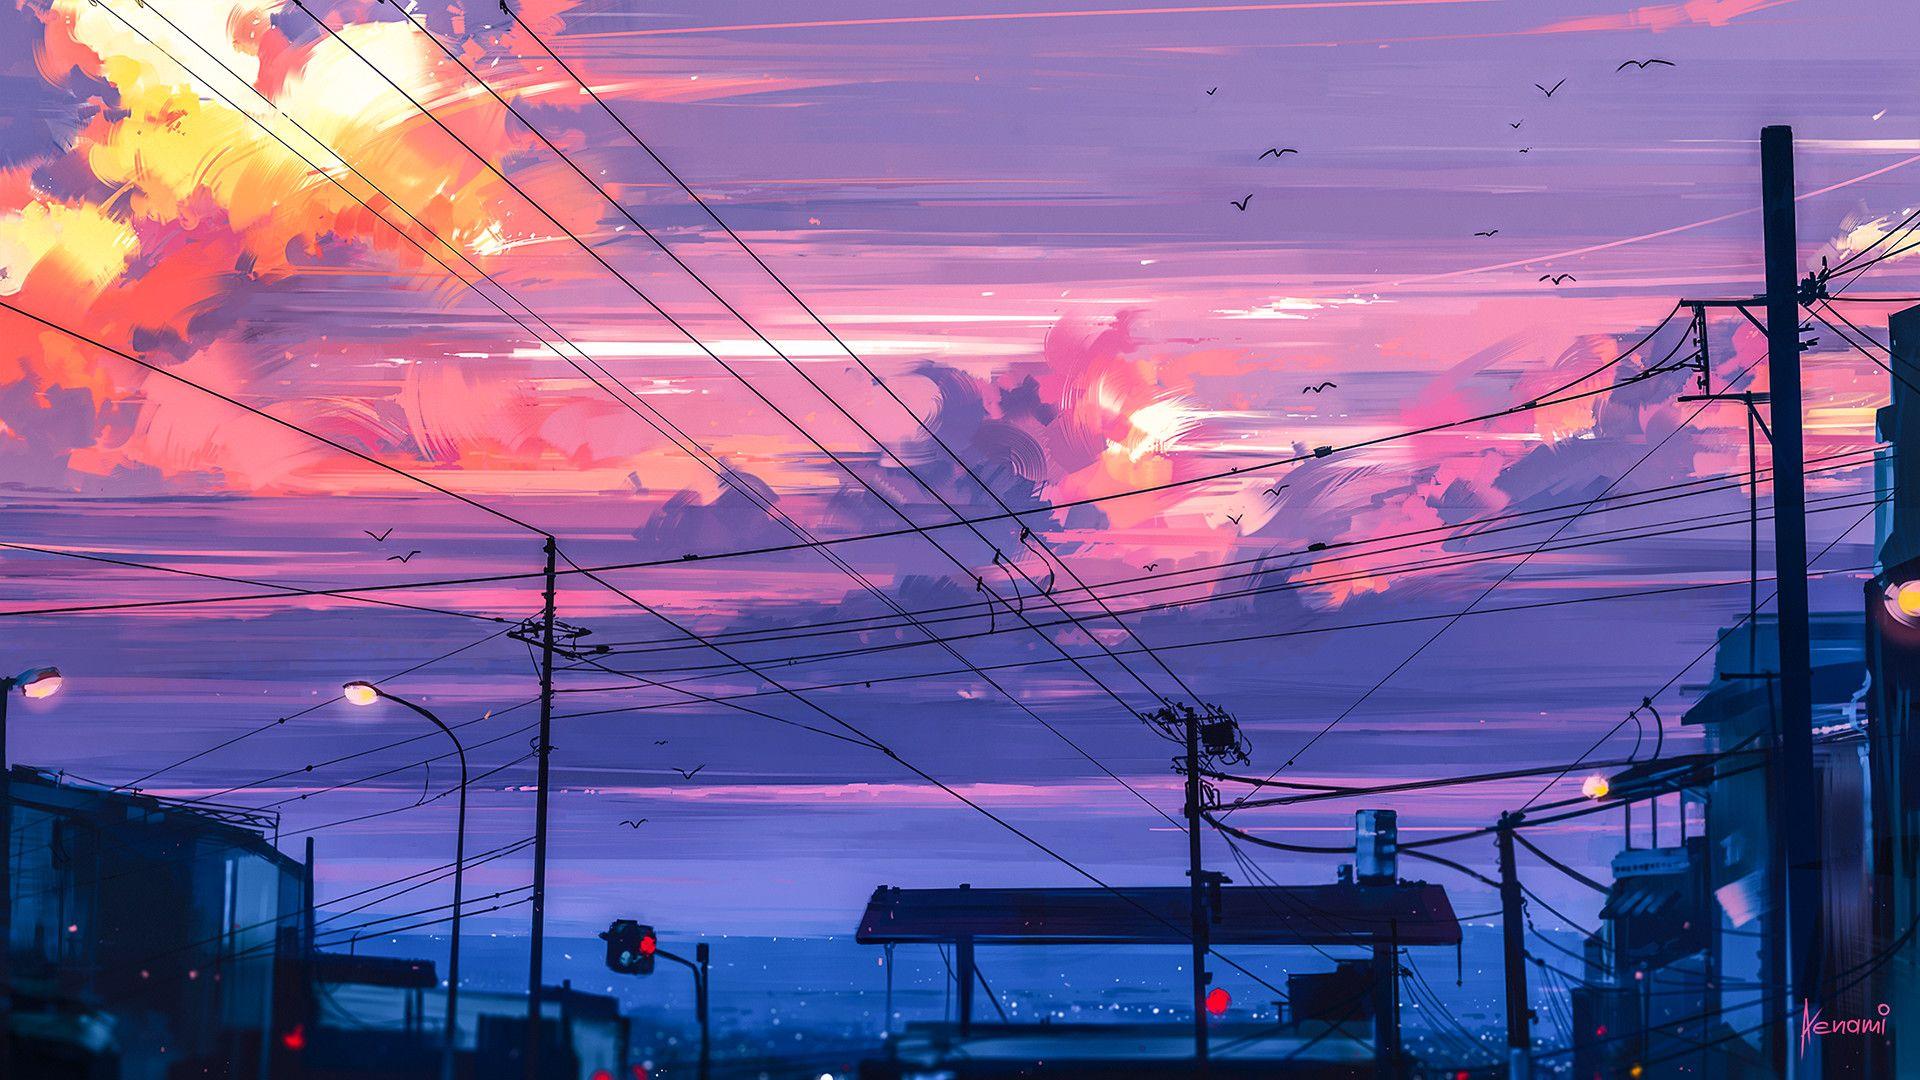 From This Moment By Alena Aenami Cdnb Artstation Com Submitted By Crowe410 To R Imaginarycolorscapes Pemandangan Anime Pemandangan Khayalan Fotografi Pantai